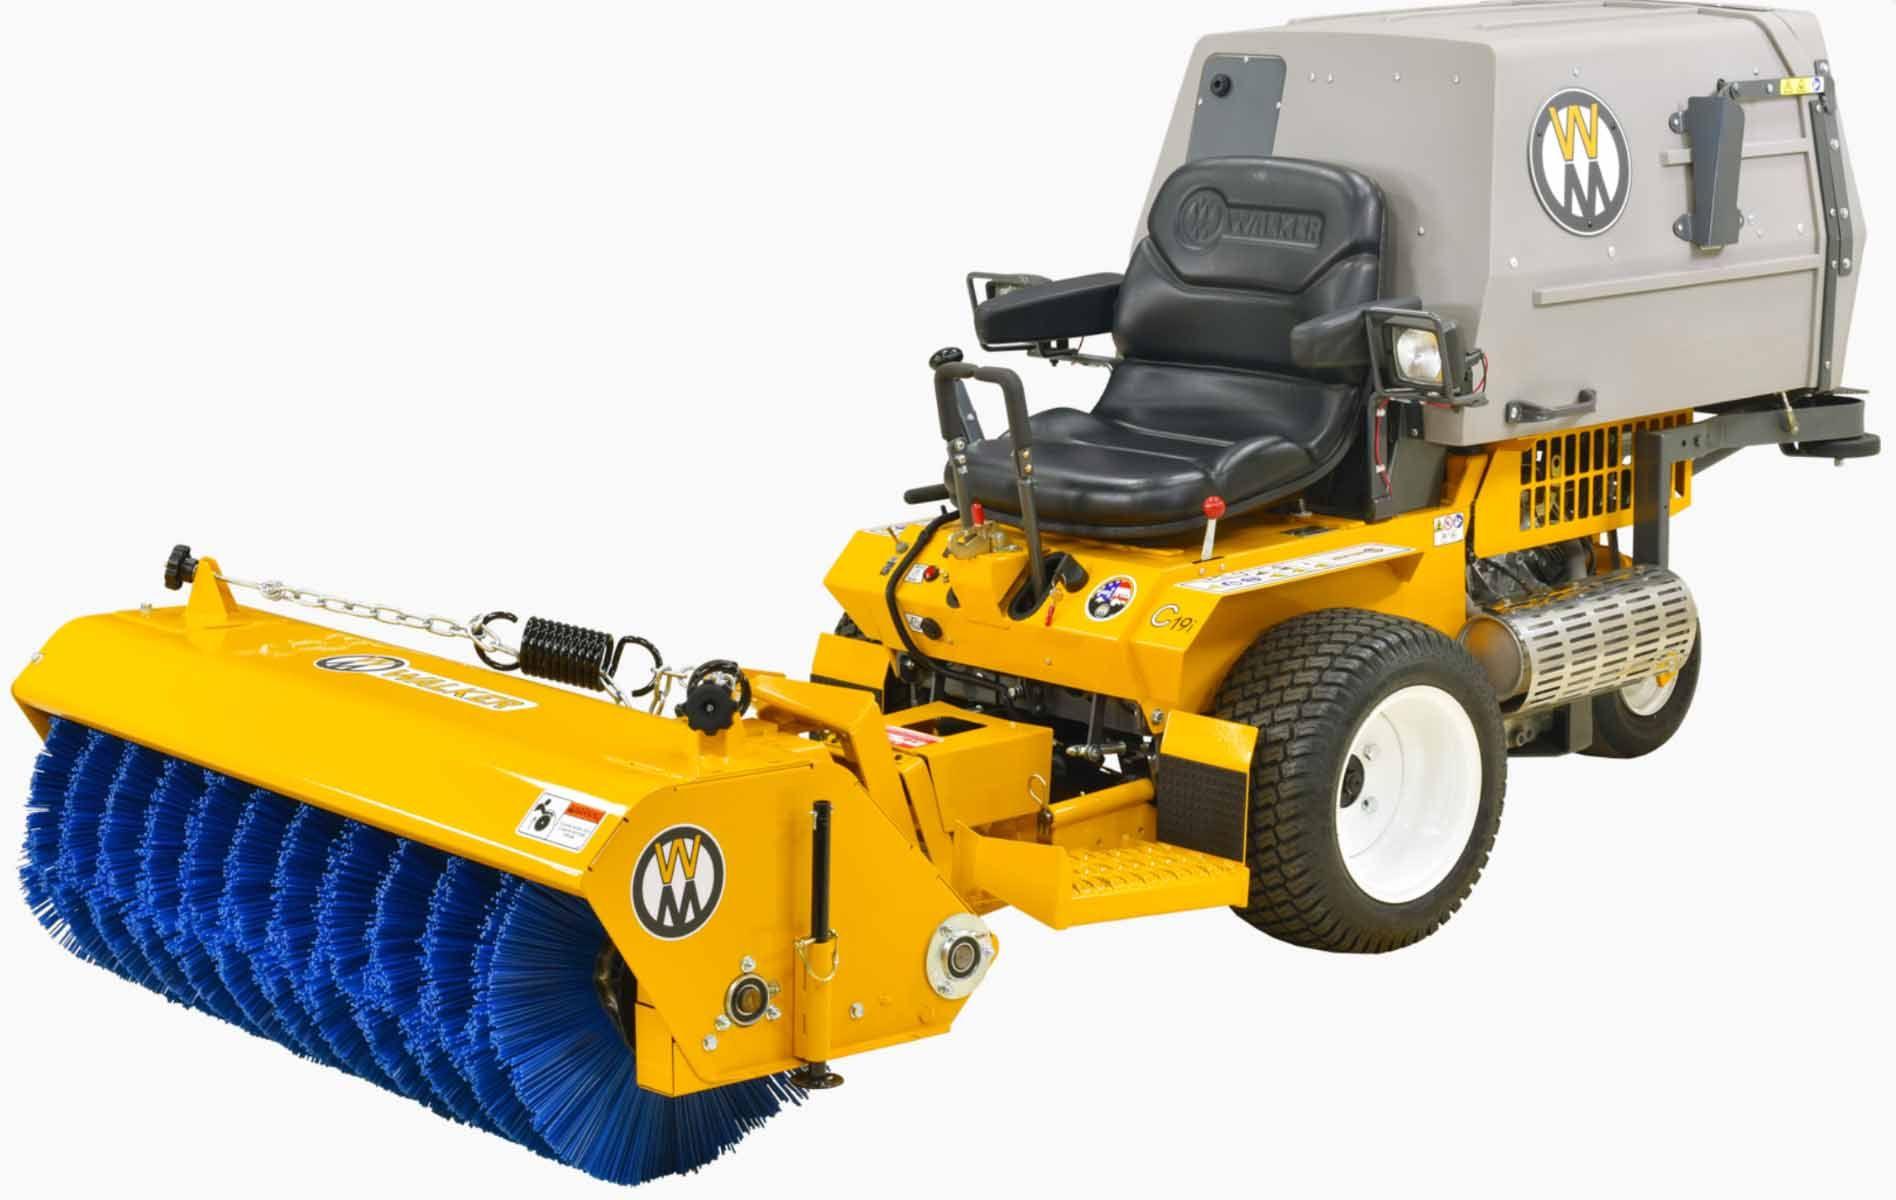 Walker Mower Rotary Broom Attachment